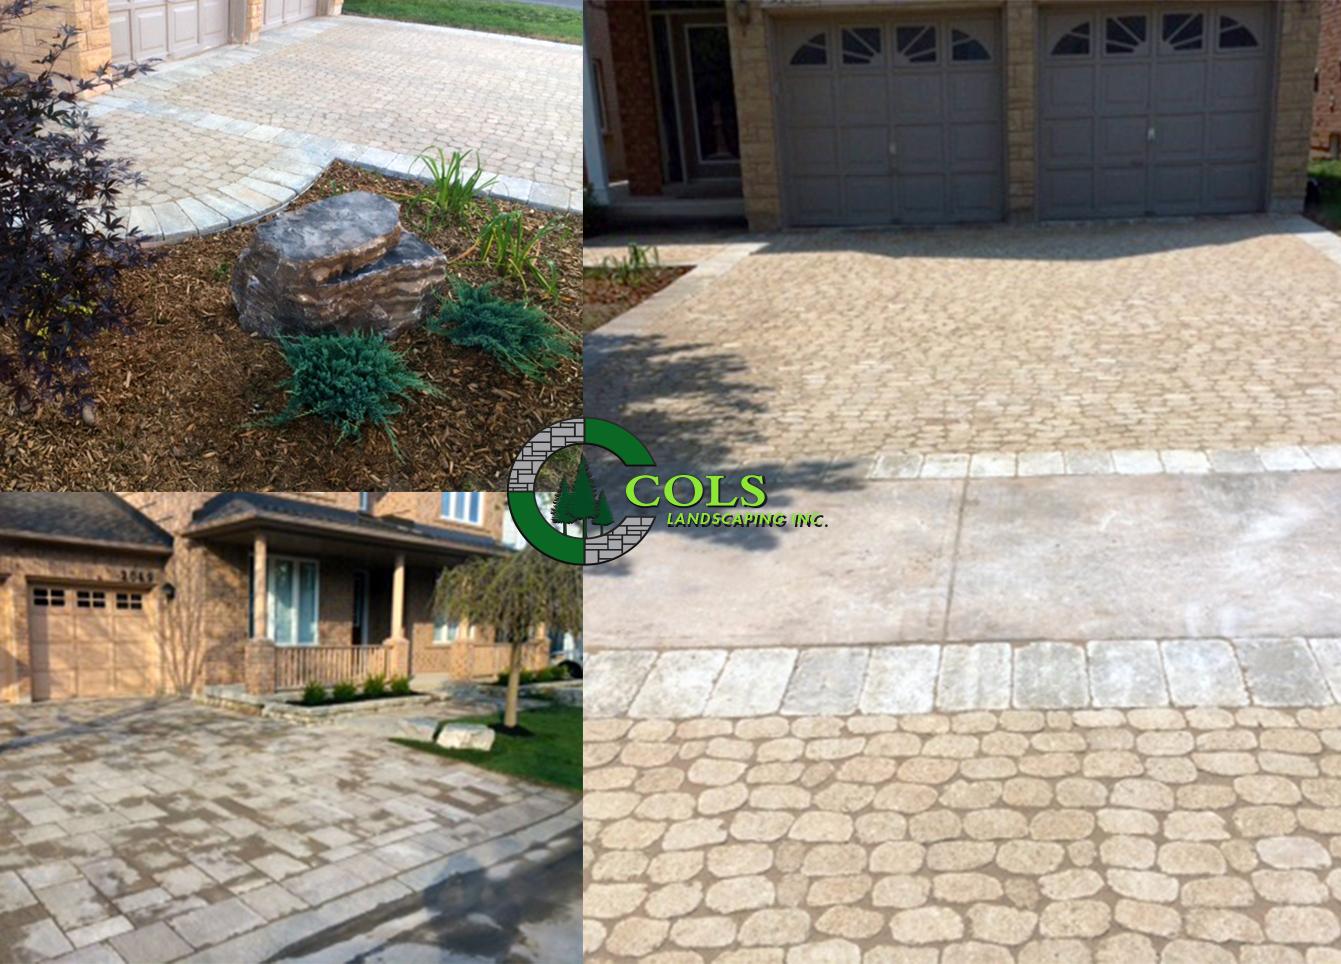 COLS replacing driveway options